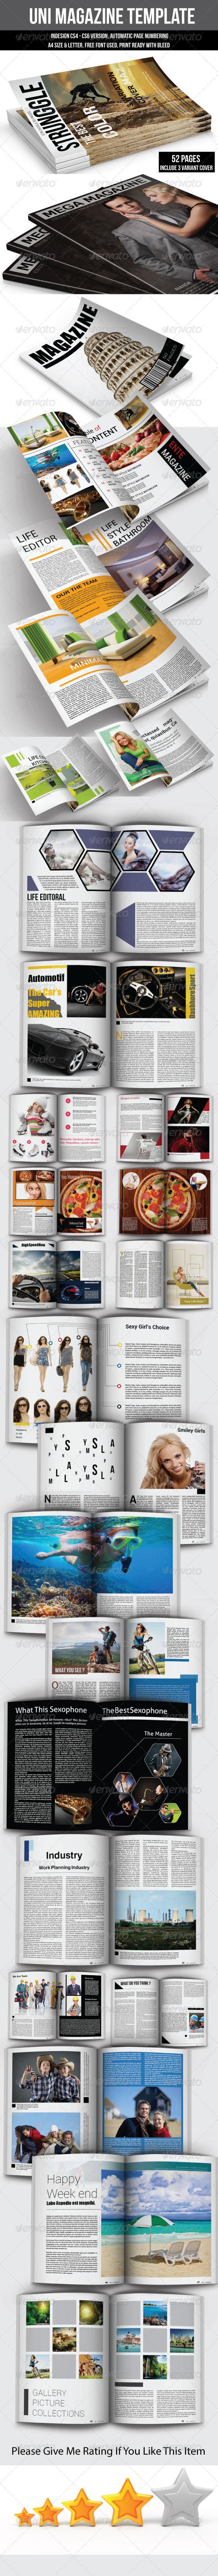 UNI Magazine Template  - Magazines Print Templates